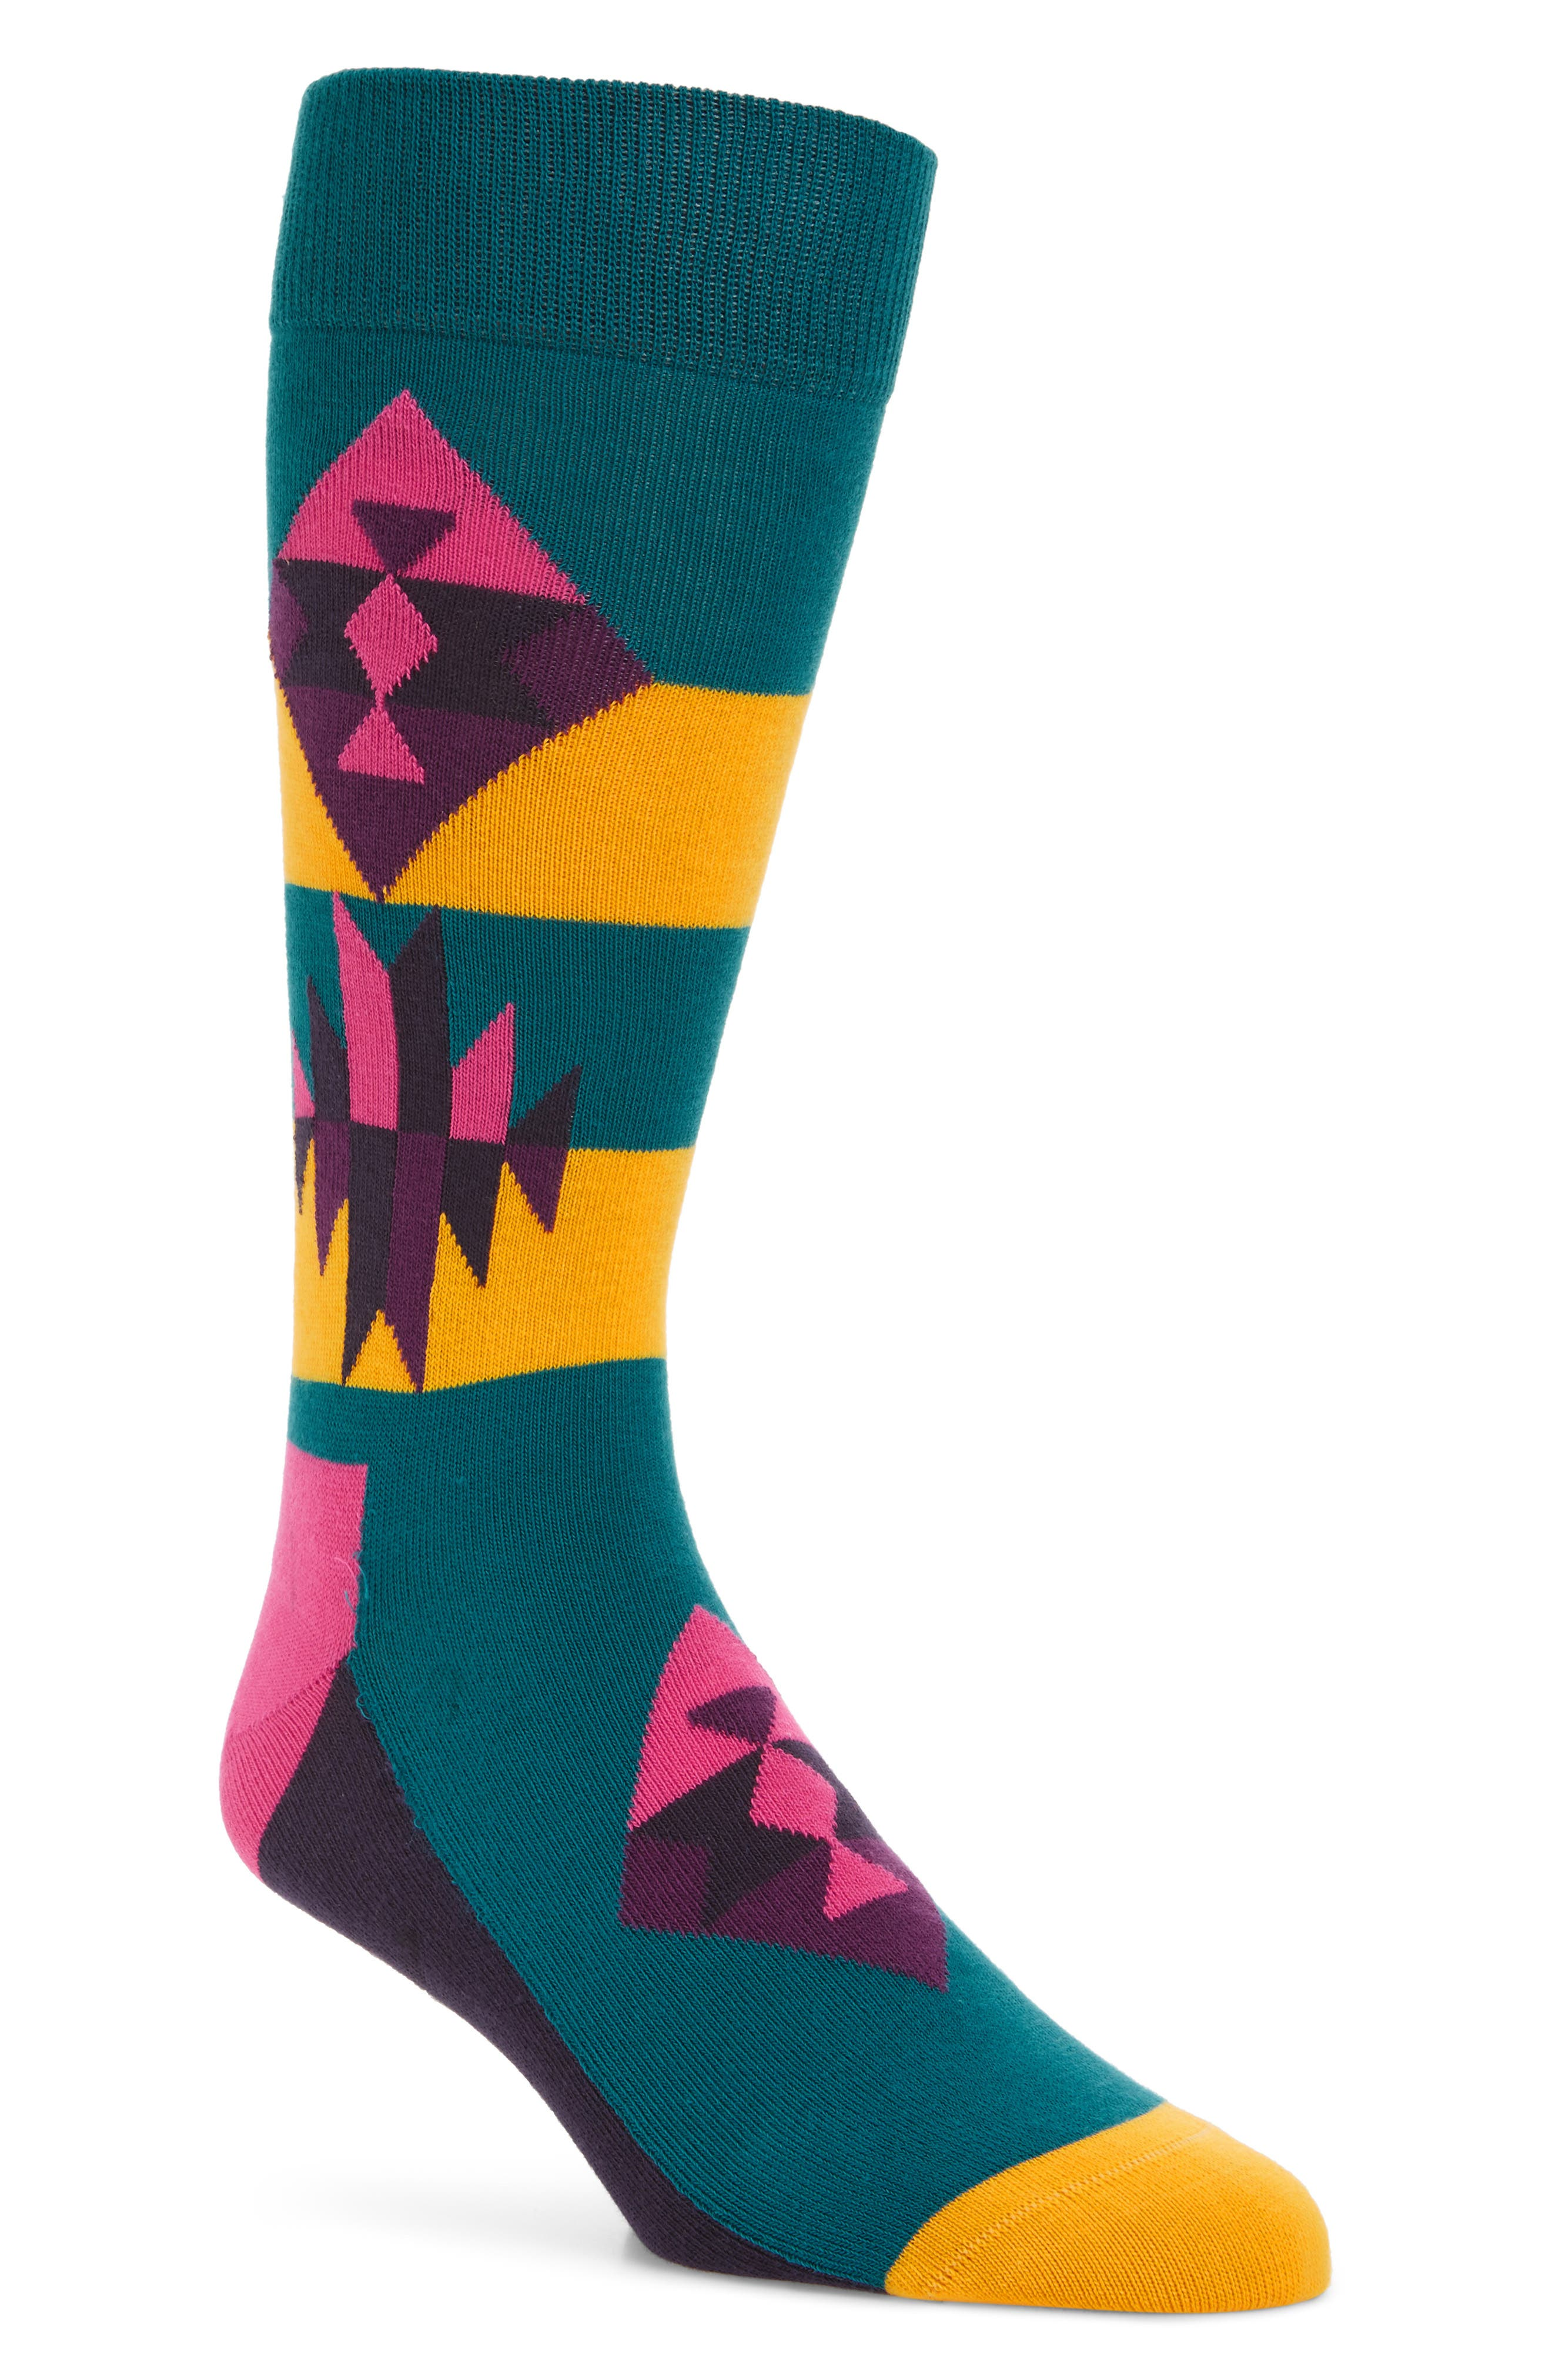 Happy Socks Inca Pattern Socks